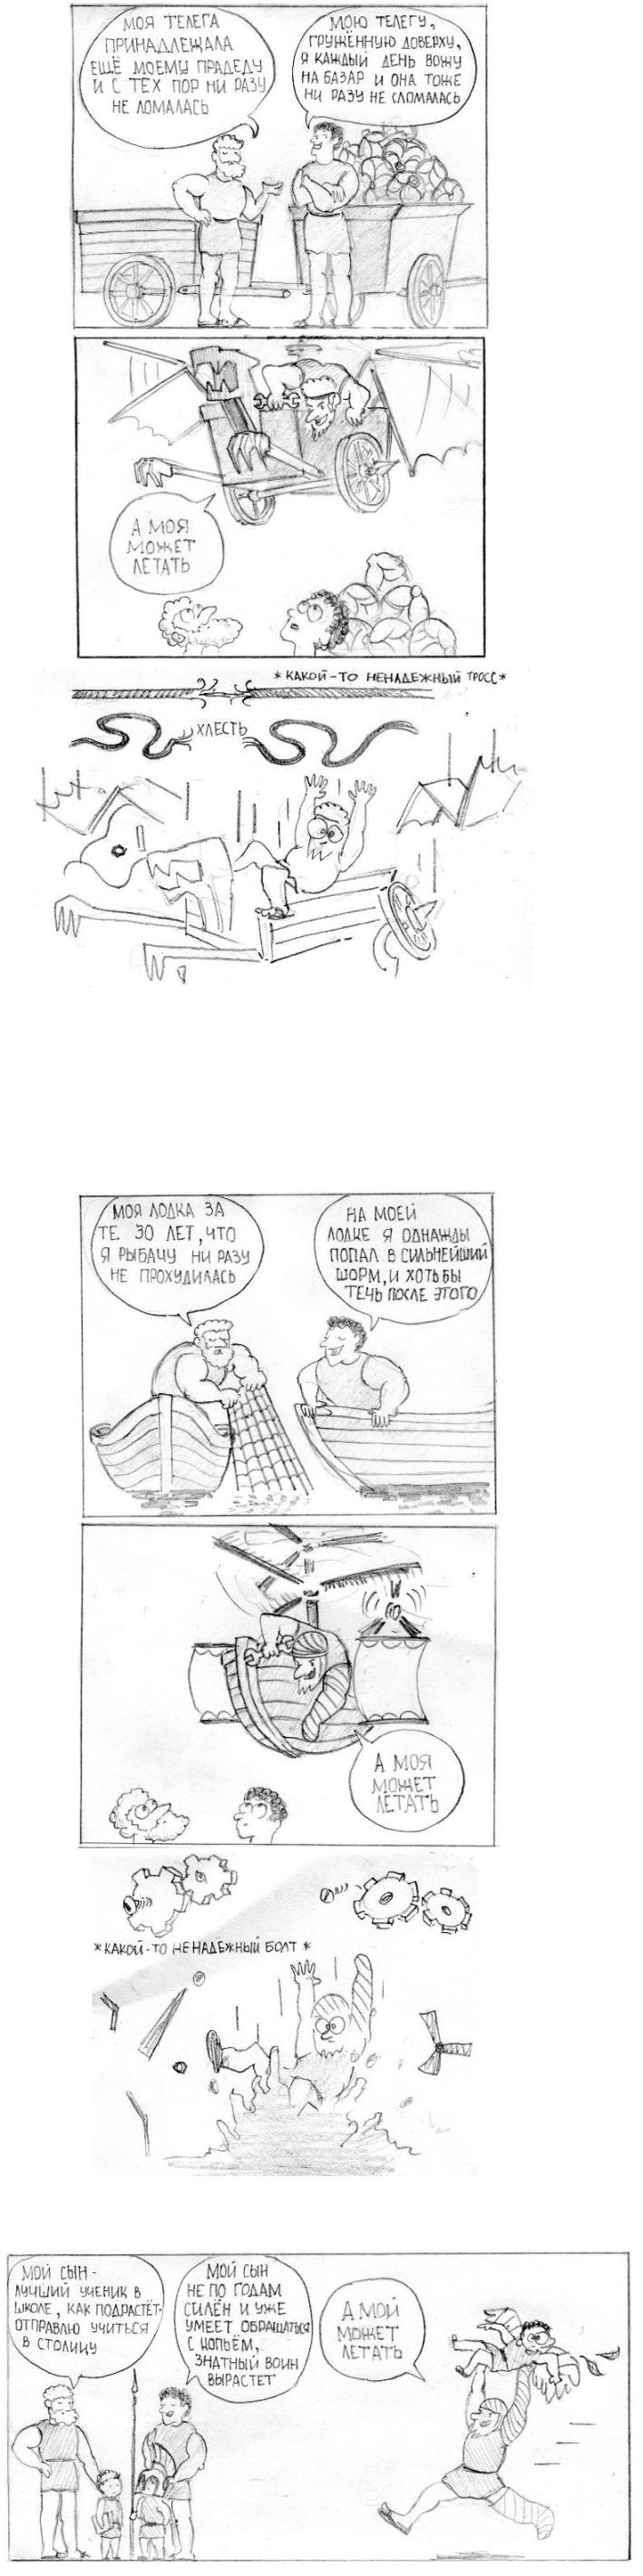 Комикс битва №16 выпуск 105